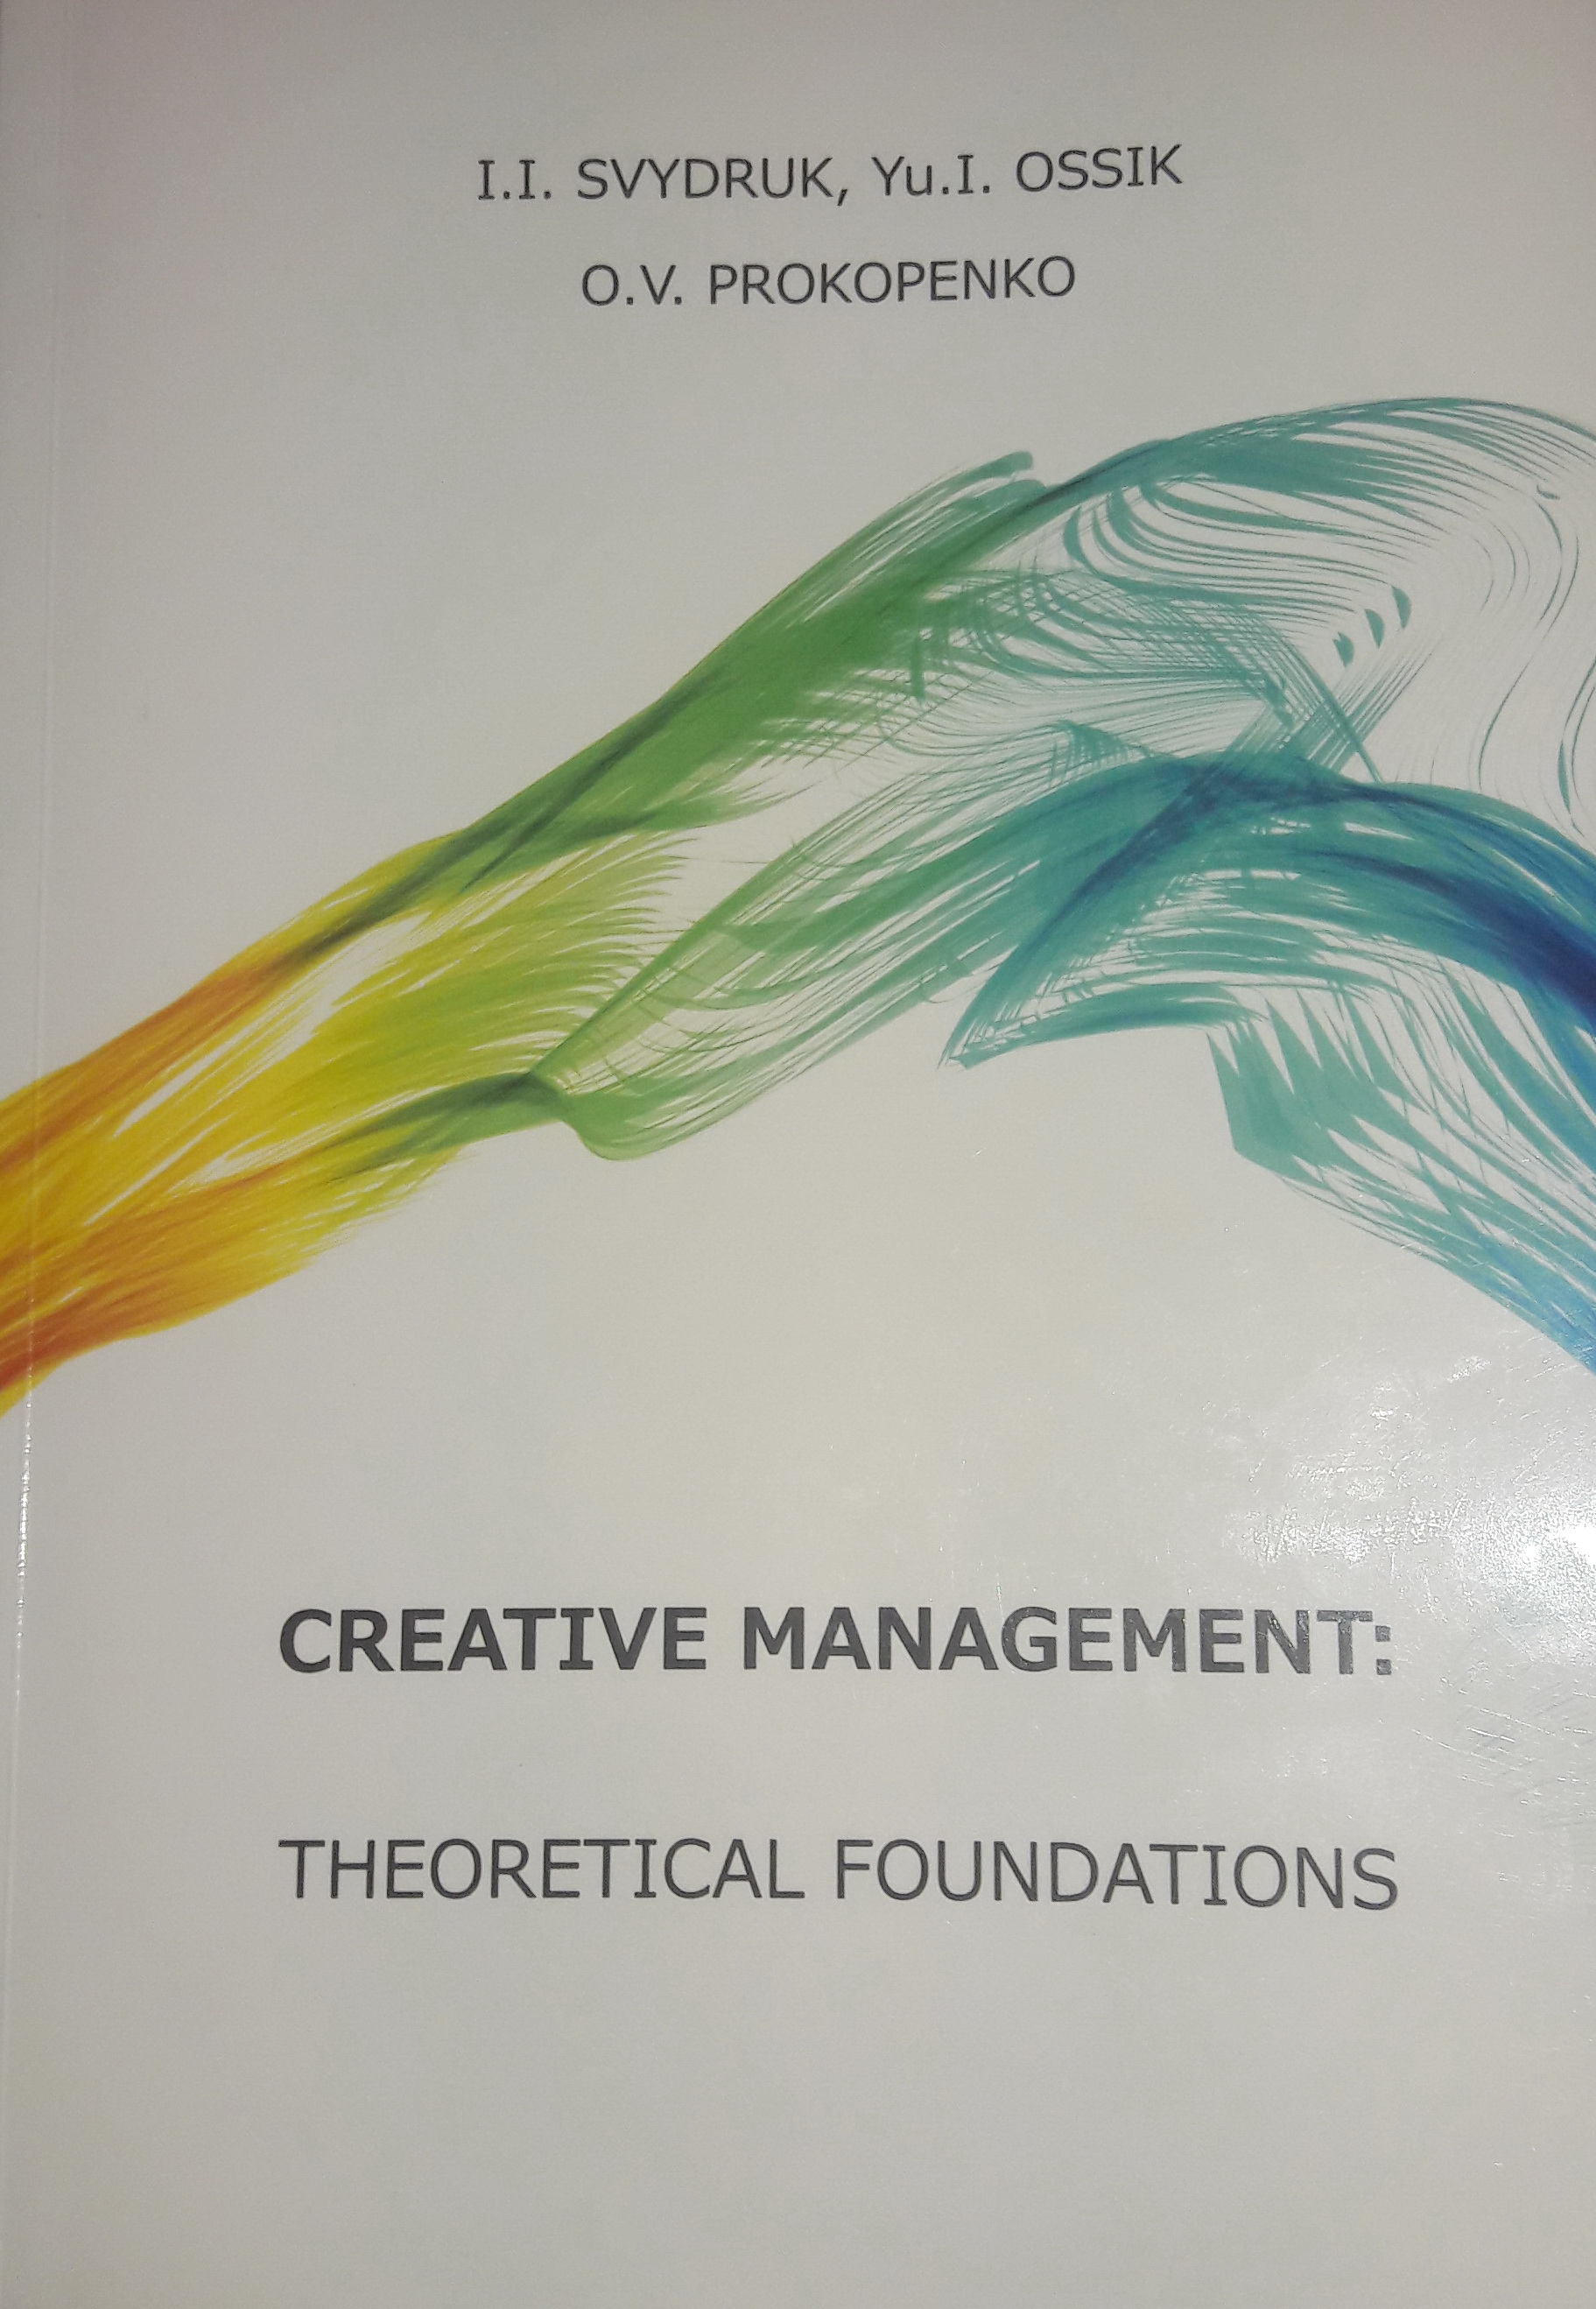 Svydruk, I.I. Creative management